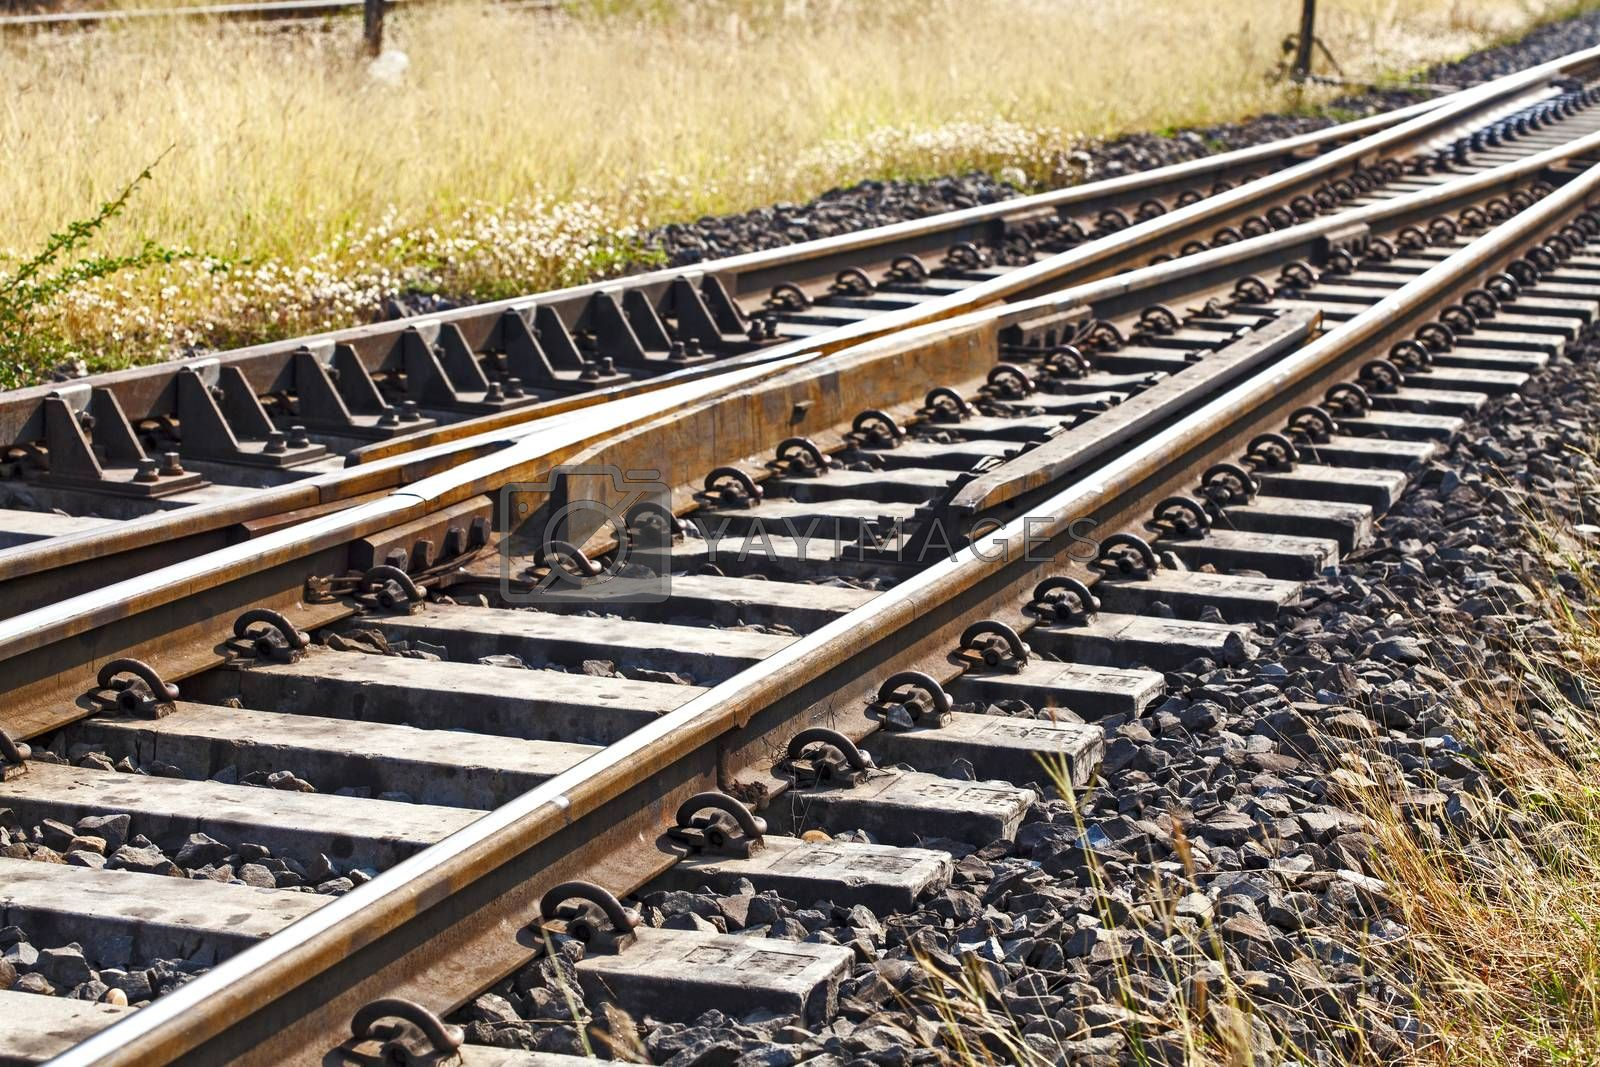 train tracks at the train depot